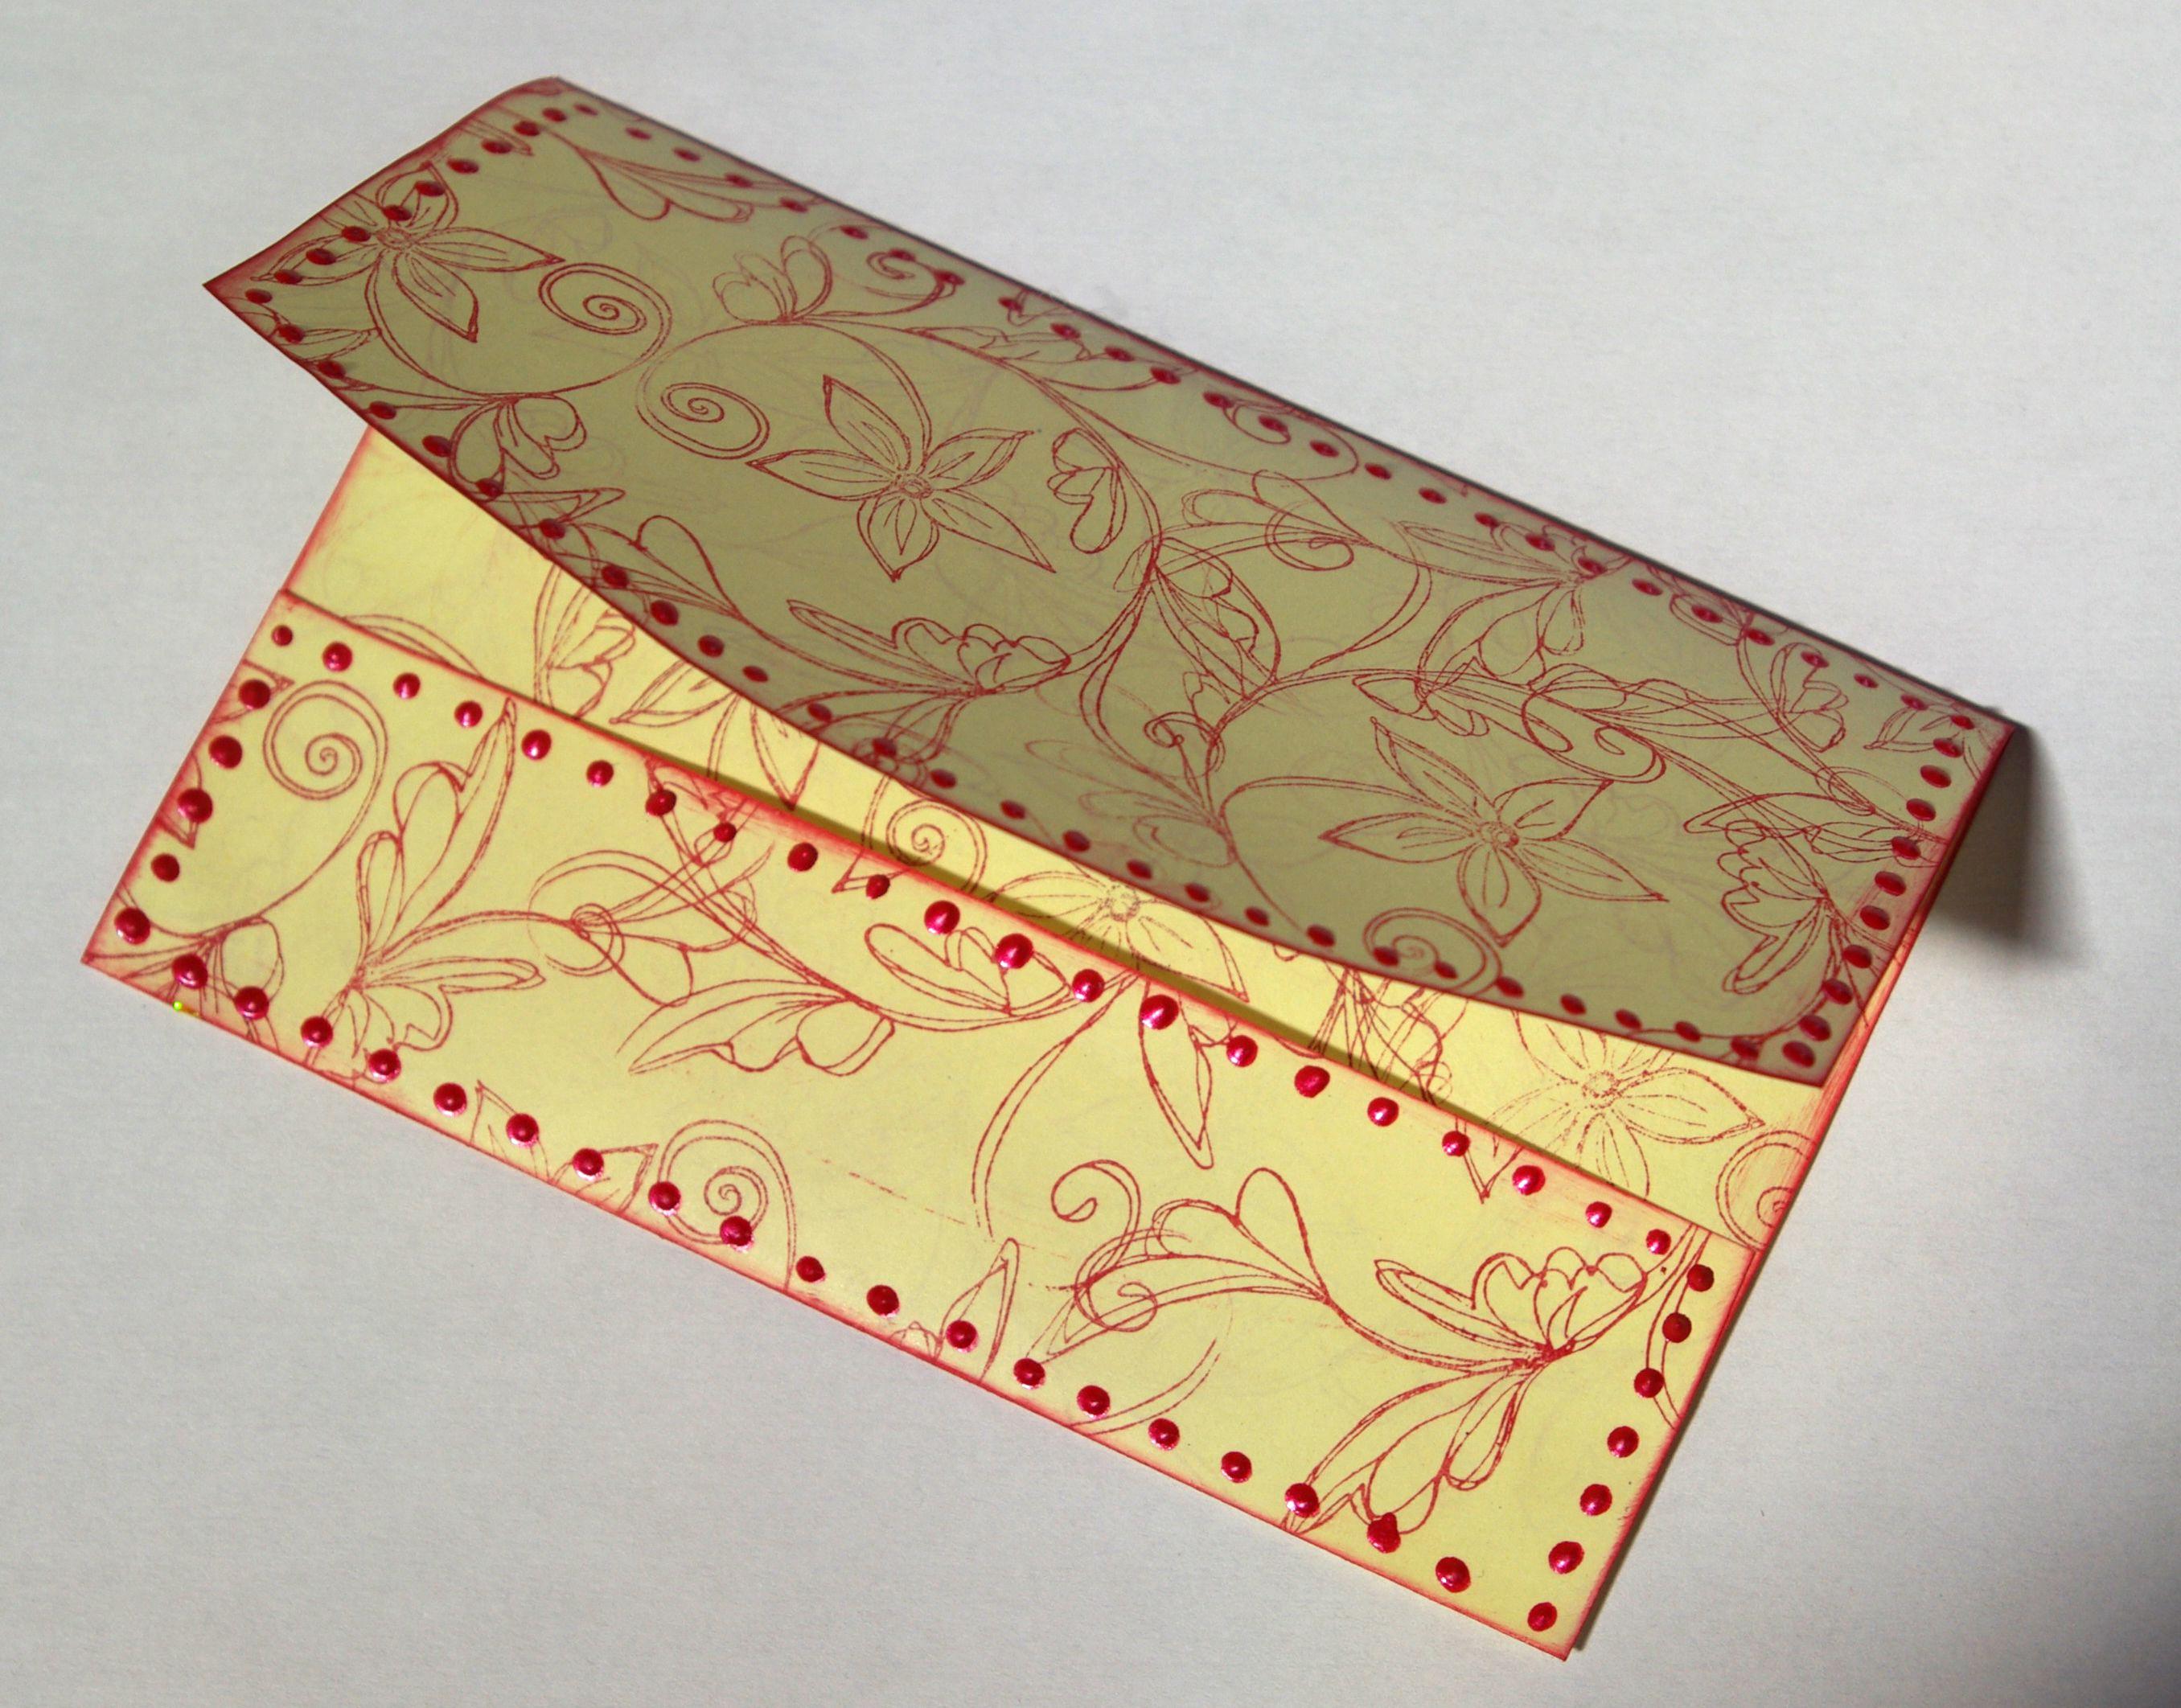 Gift Card Envelope Template Lovely Free Printable Gift Card Envelope Template